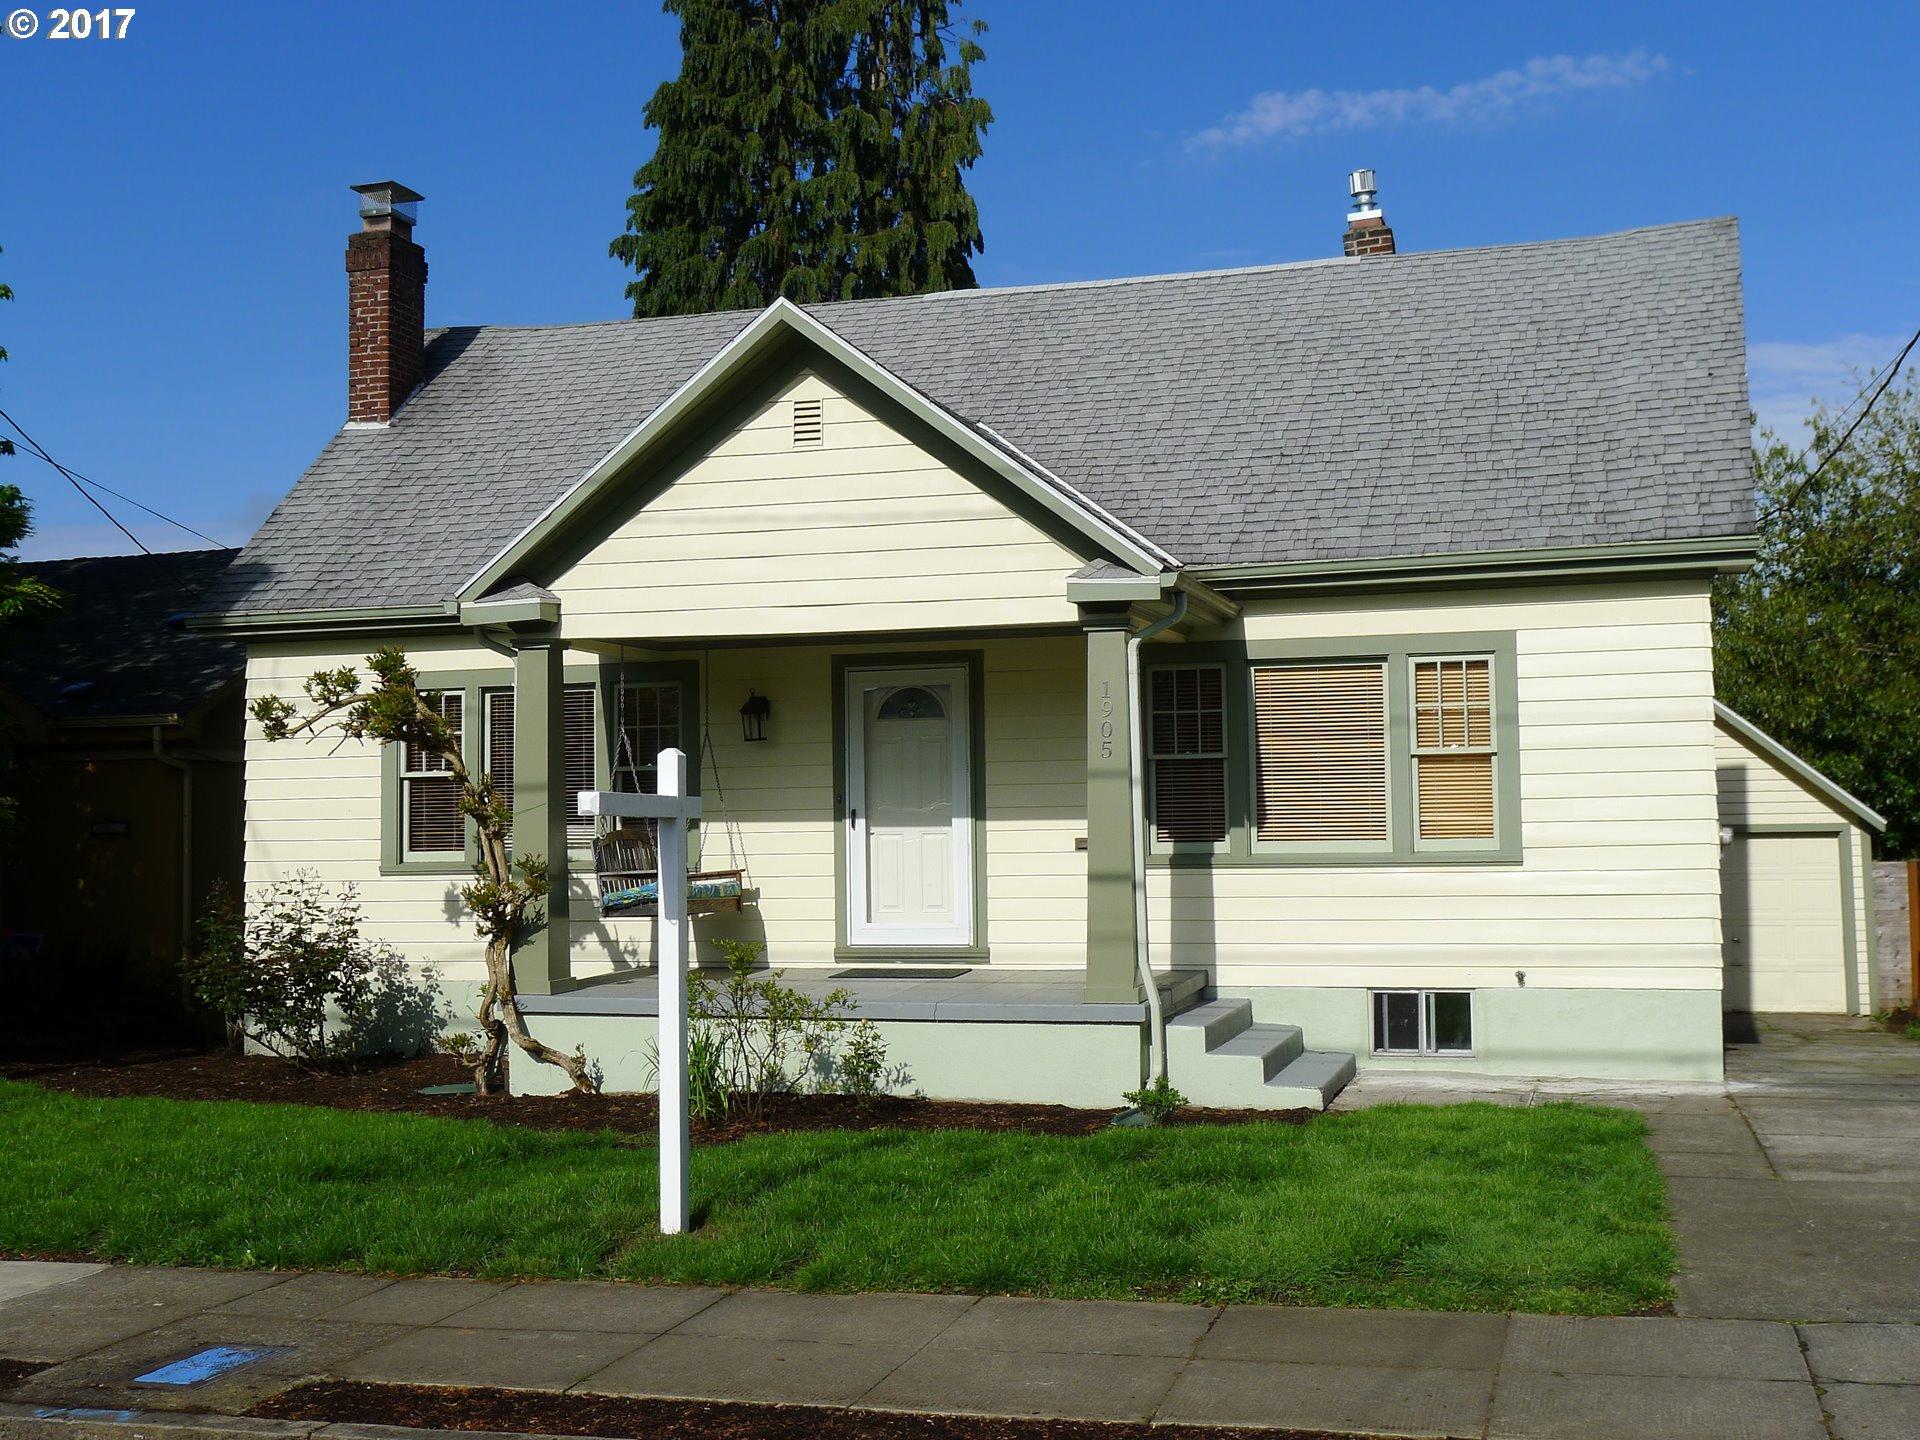 1905 SE 58TH AVE, Portland, OR 97215